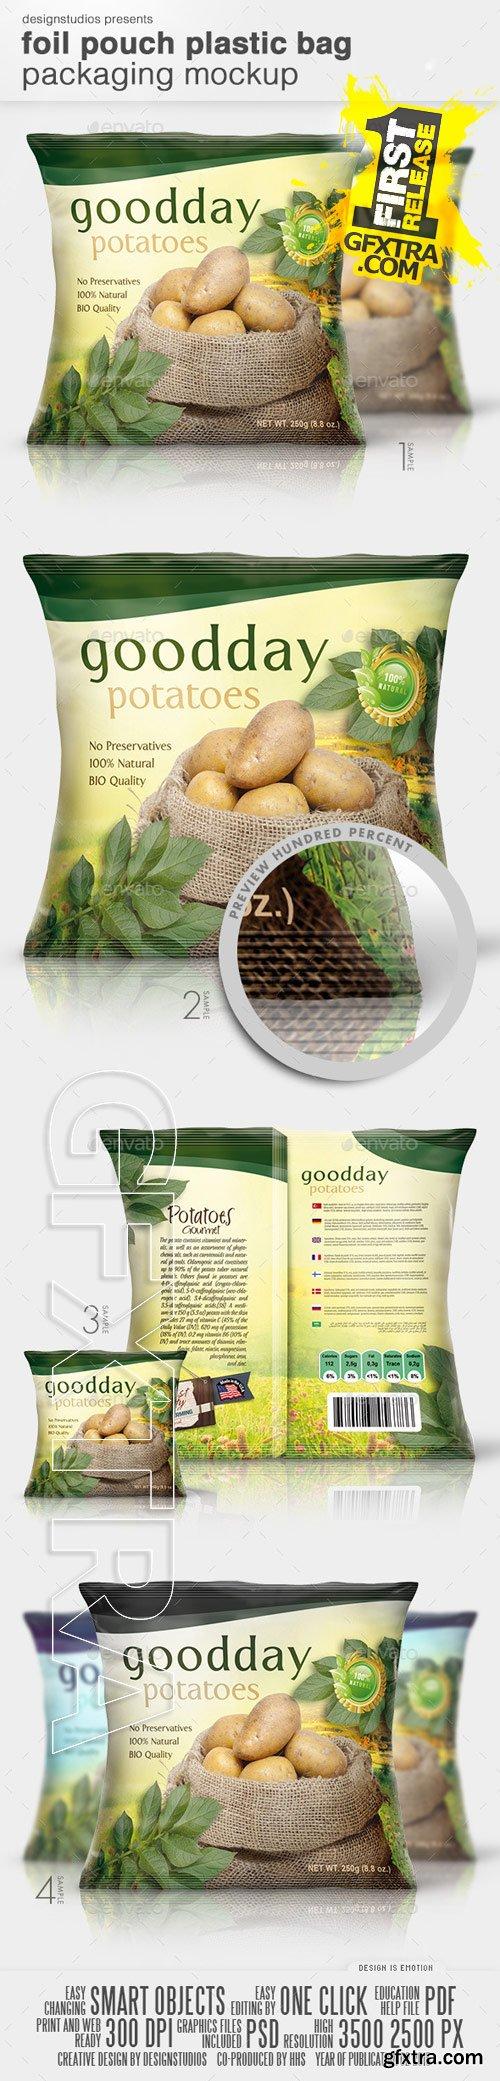 GraphicRiver - Foil Pouch Plastic Bag Packaging Mock-Up 10545171